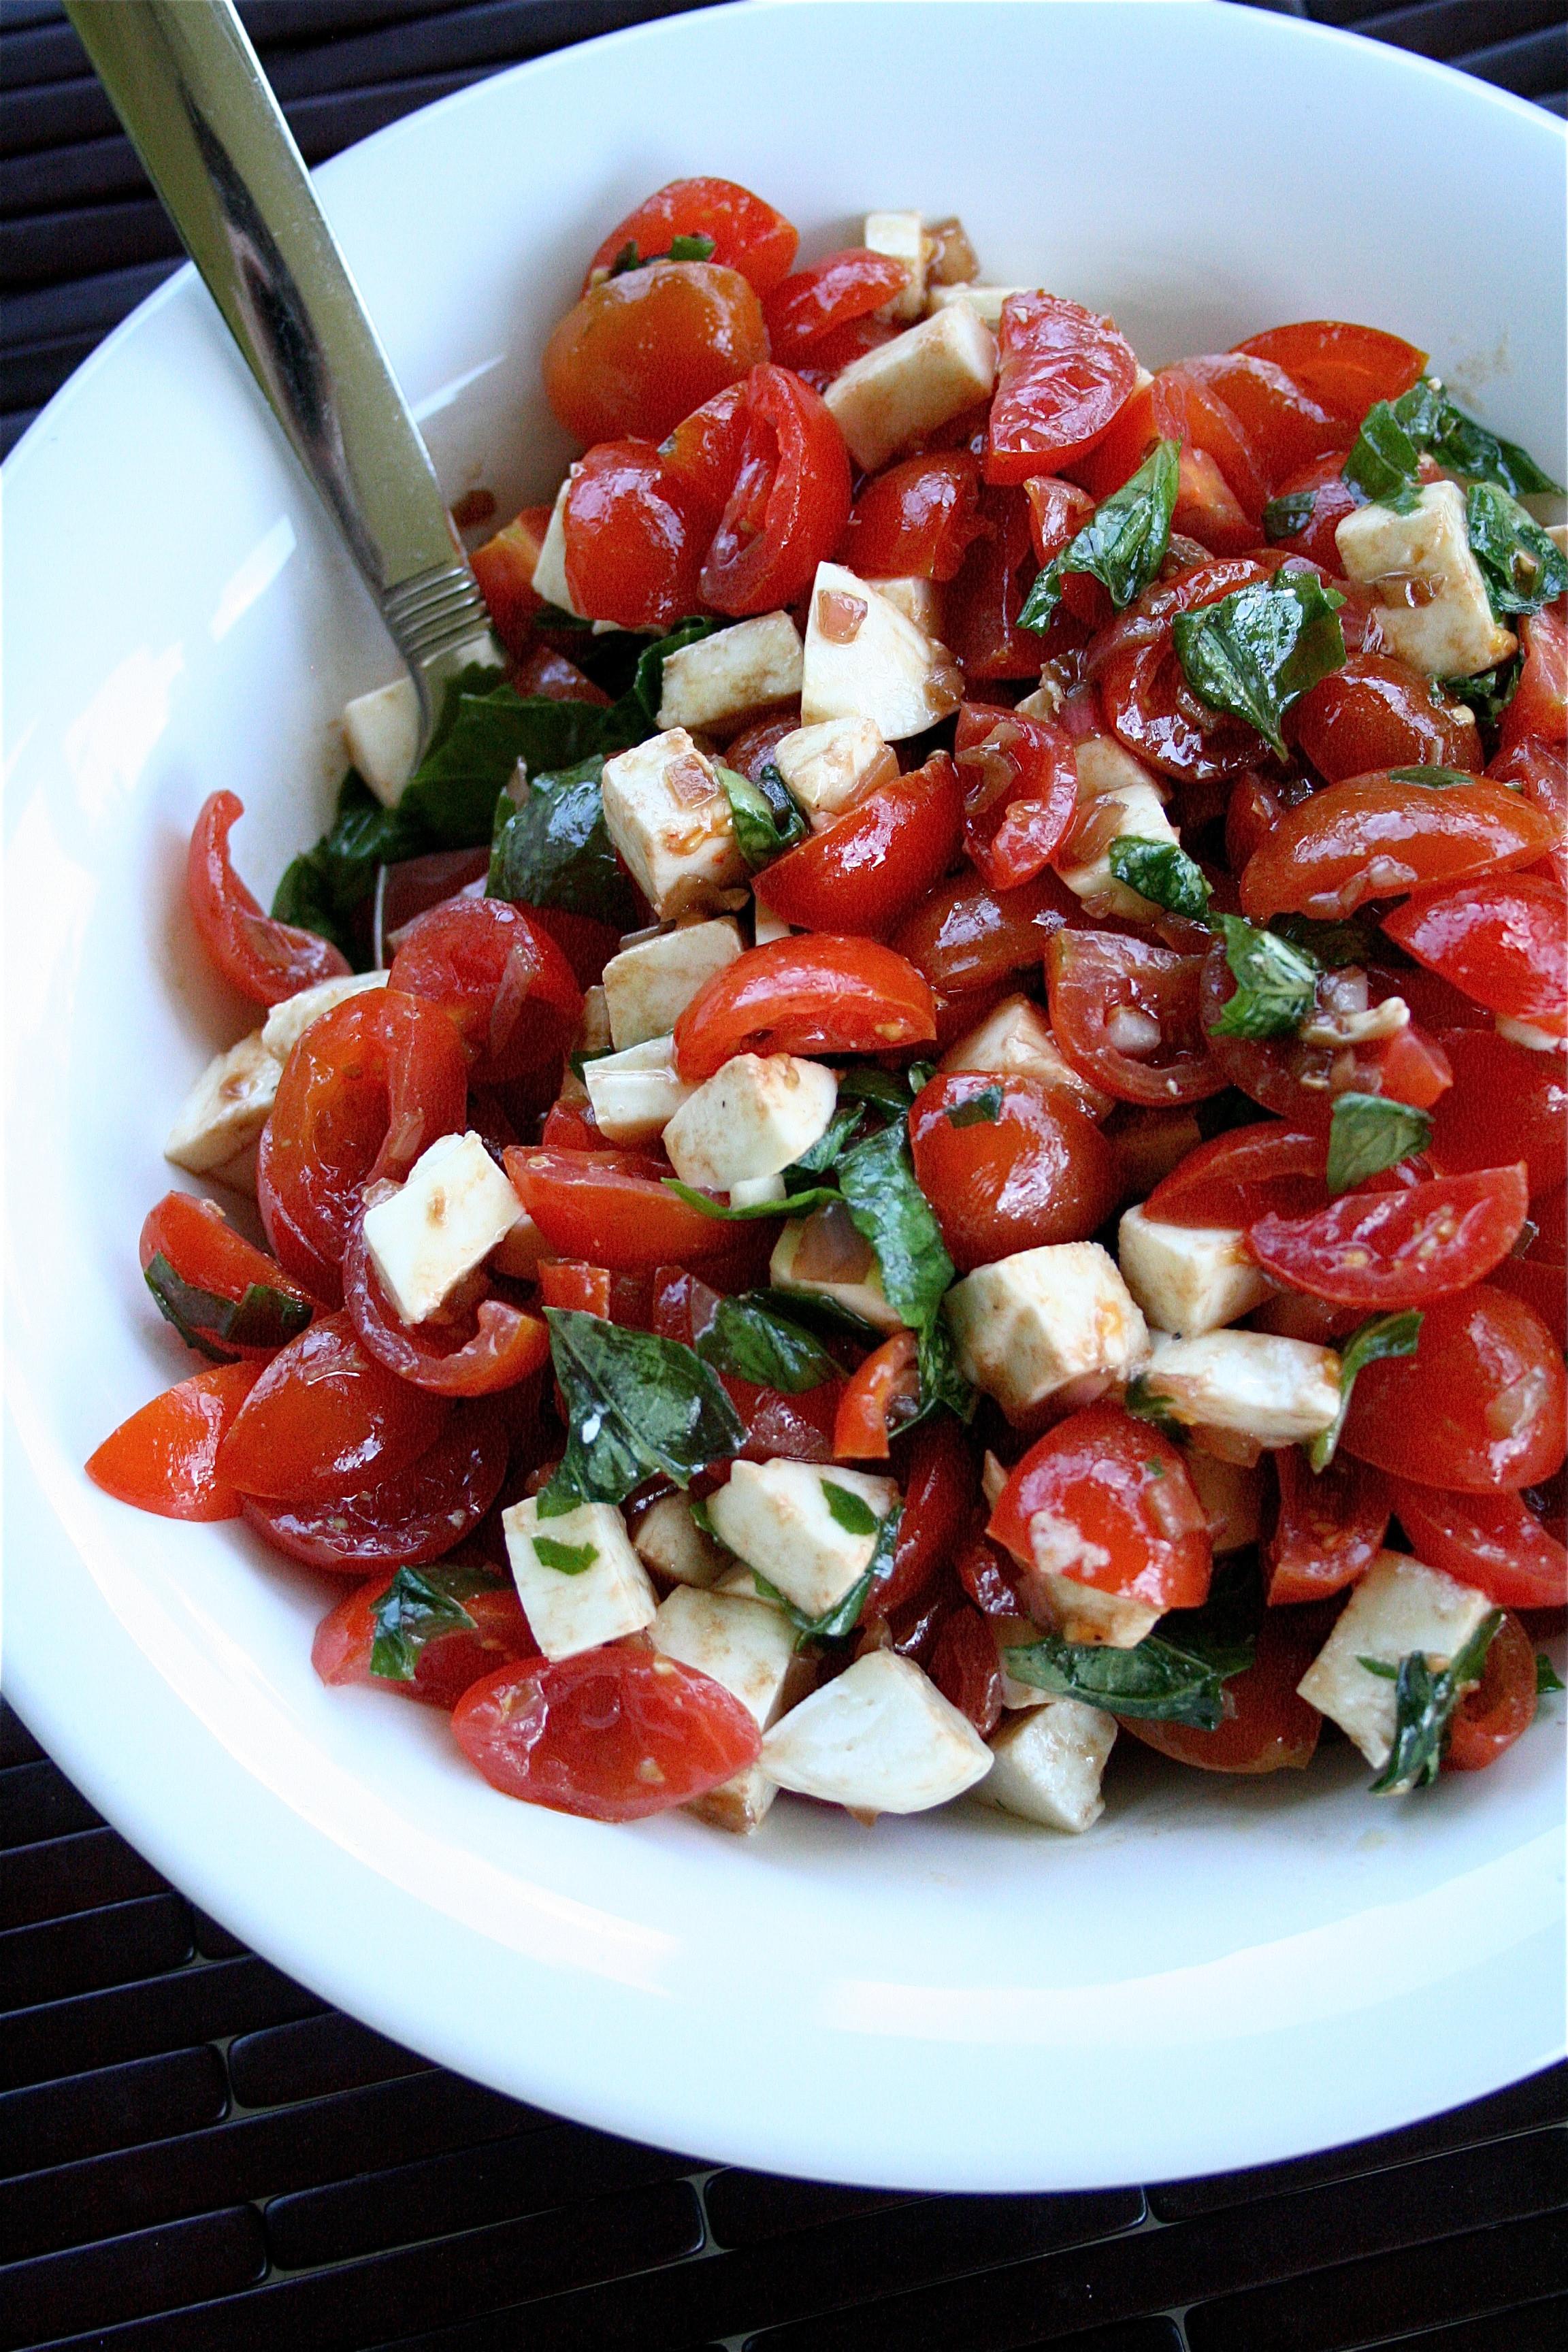 Tomato And Mozzarella Salad  Cherry Tomato Salad With Basil And Mozzarella